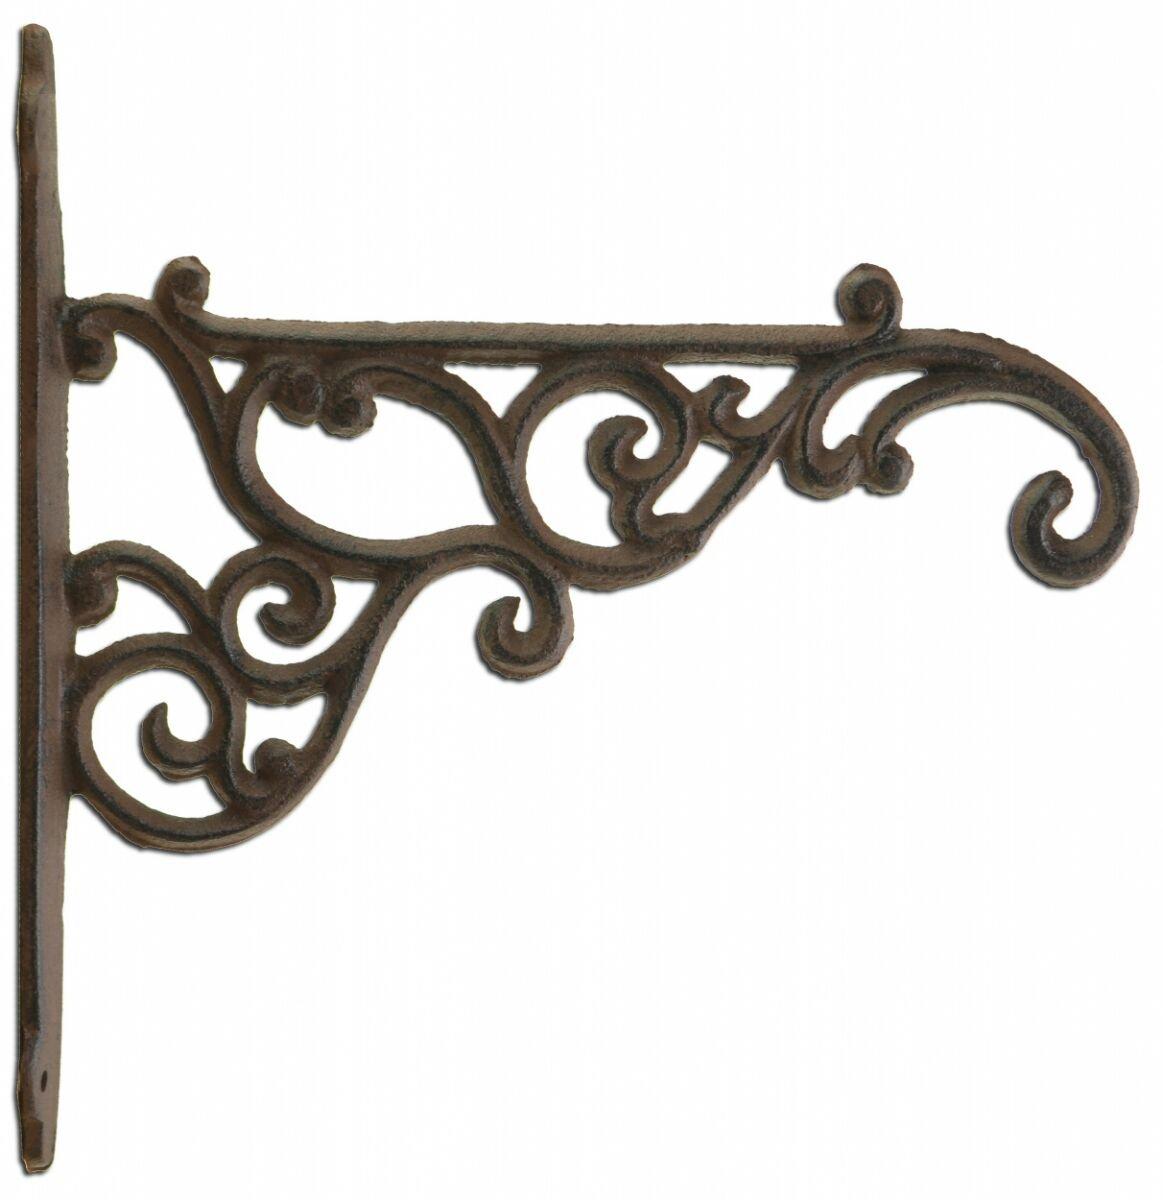 "Decorative Plant Hanger Ornate Victorian Cast Iron Flower Basket Hook 8.375"" Deep"